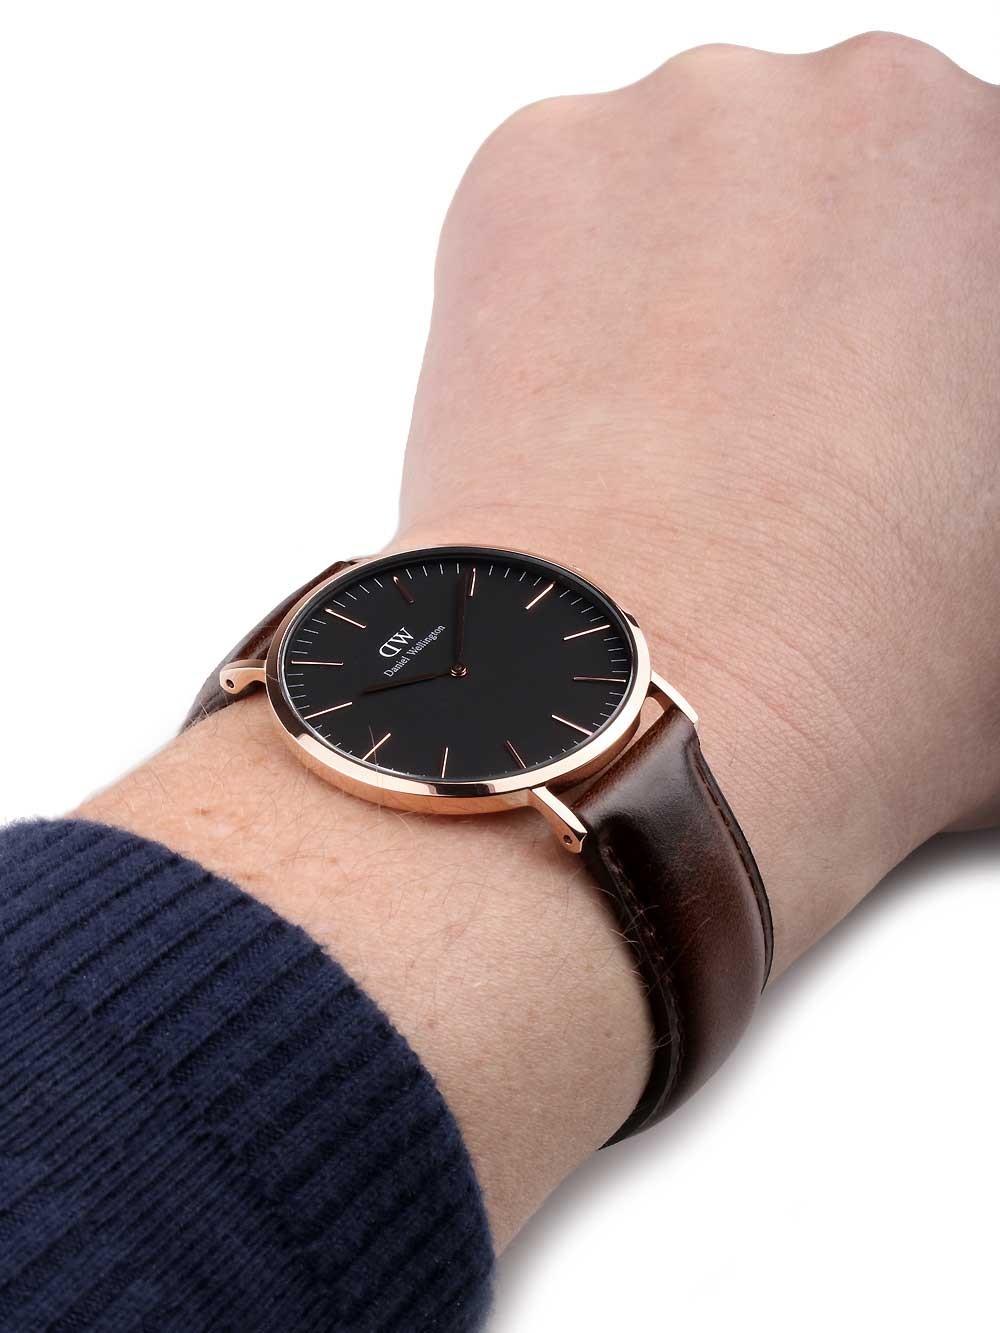 Watches Chrono12 Daniel Wellington Dw00100125 Classic